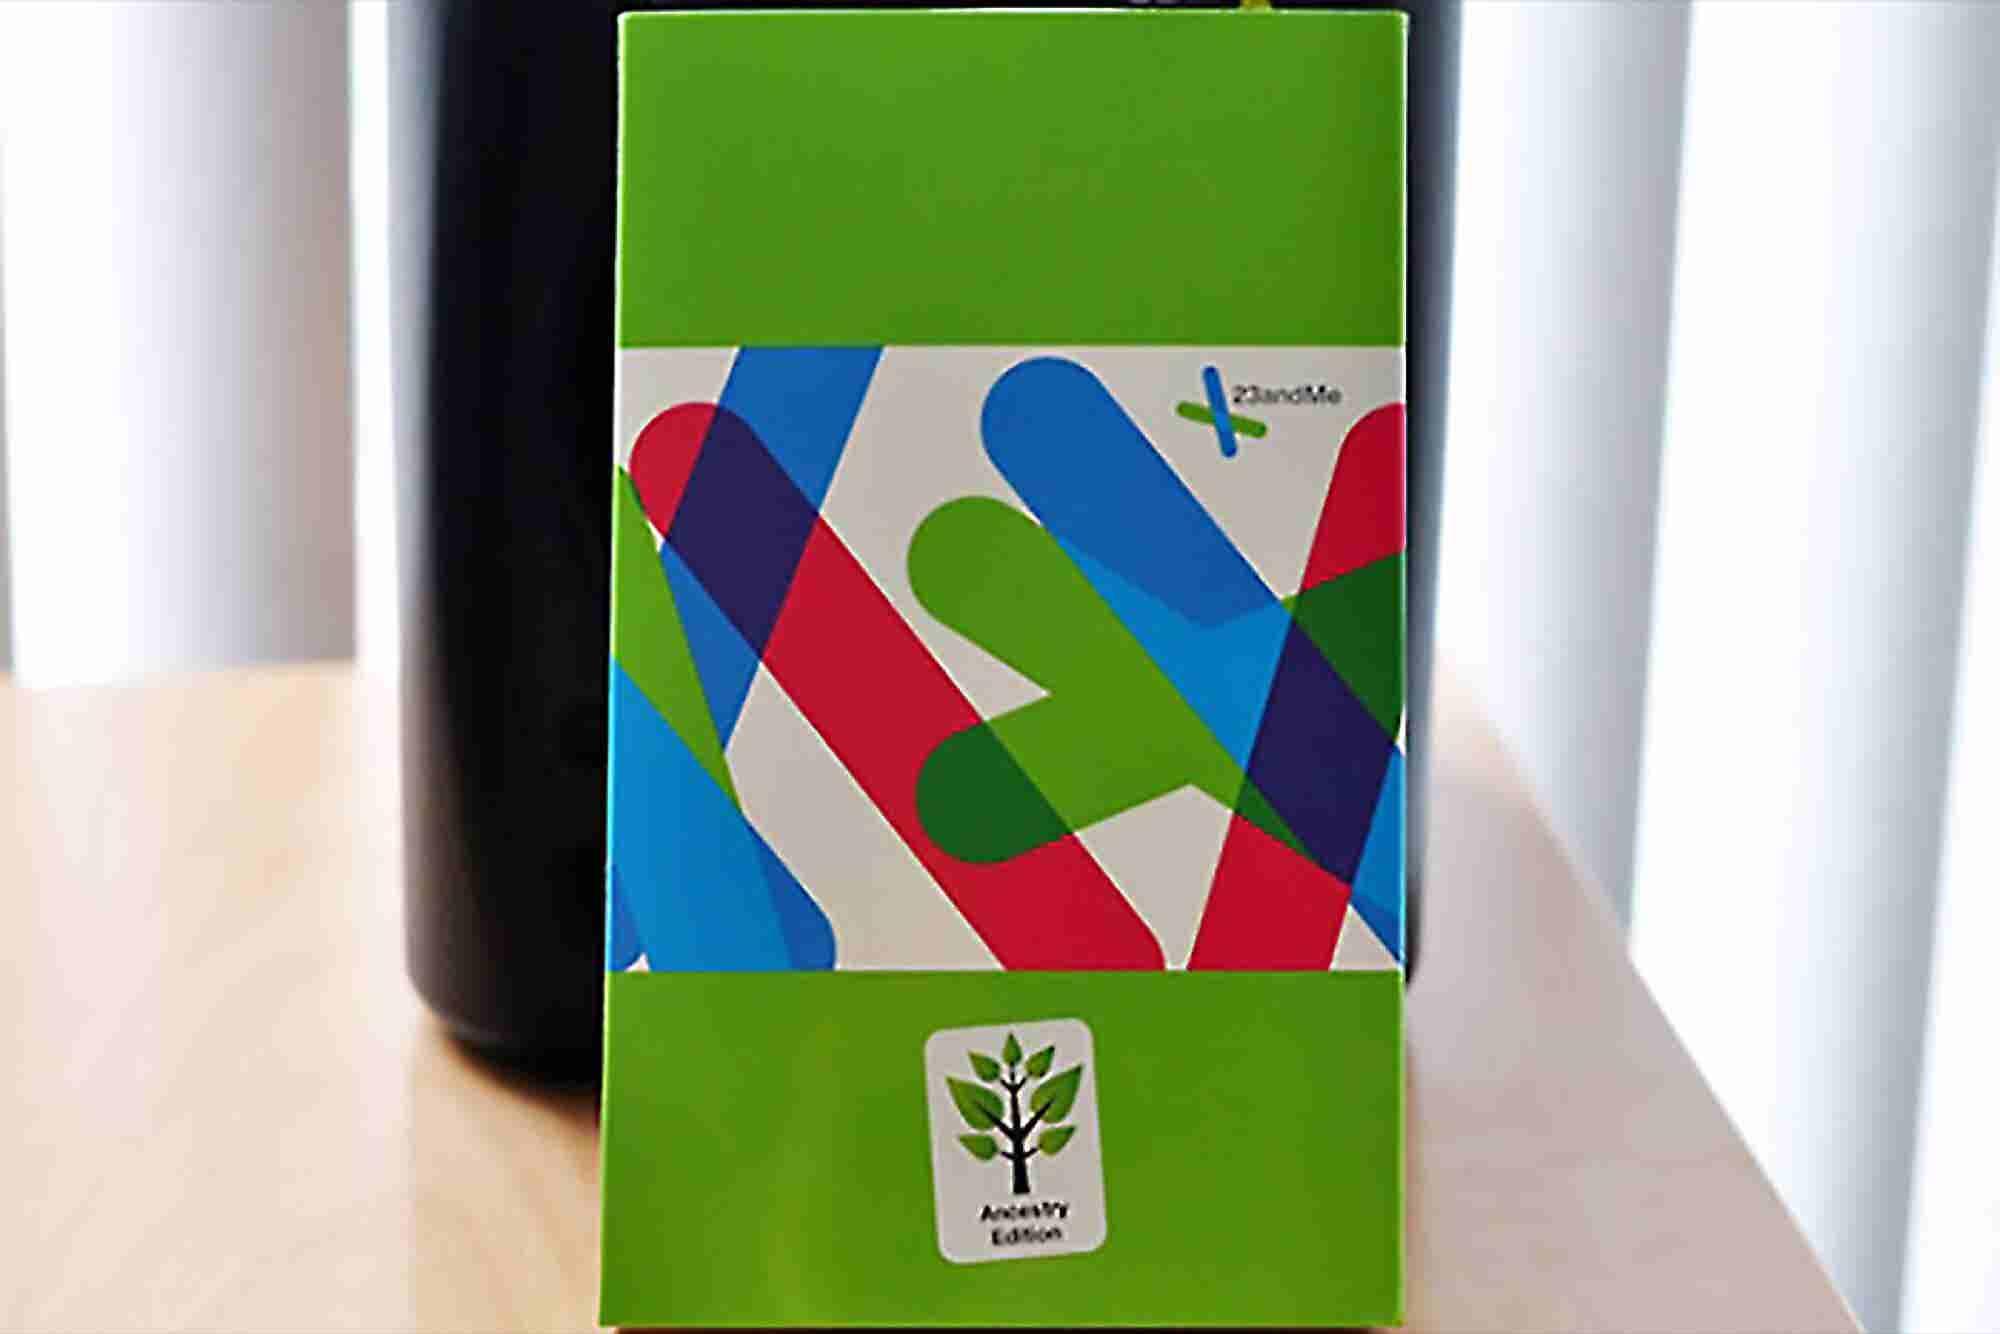 FDA Tells 23andMe to Quit Selling Genetic Testing Kits